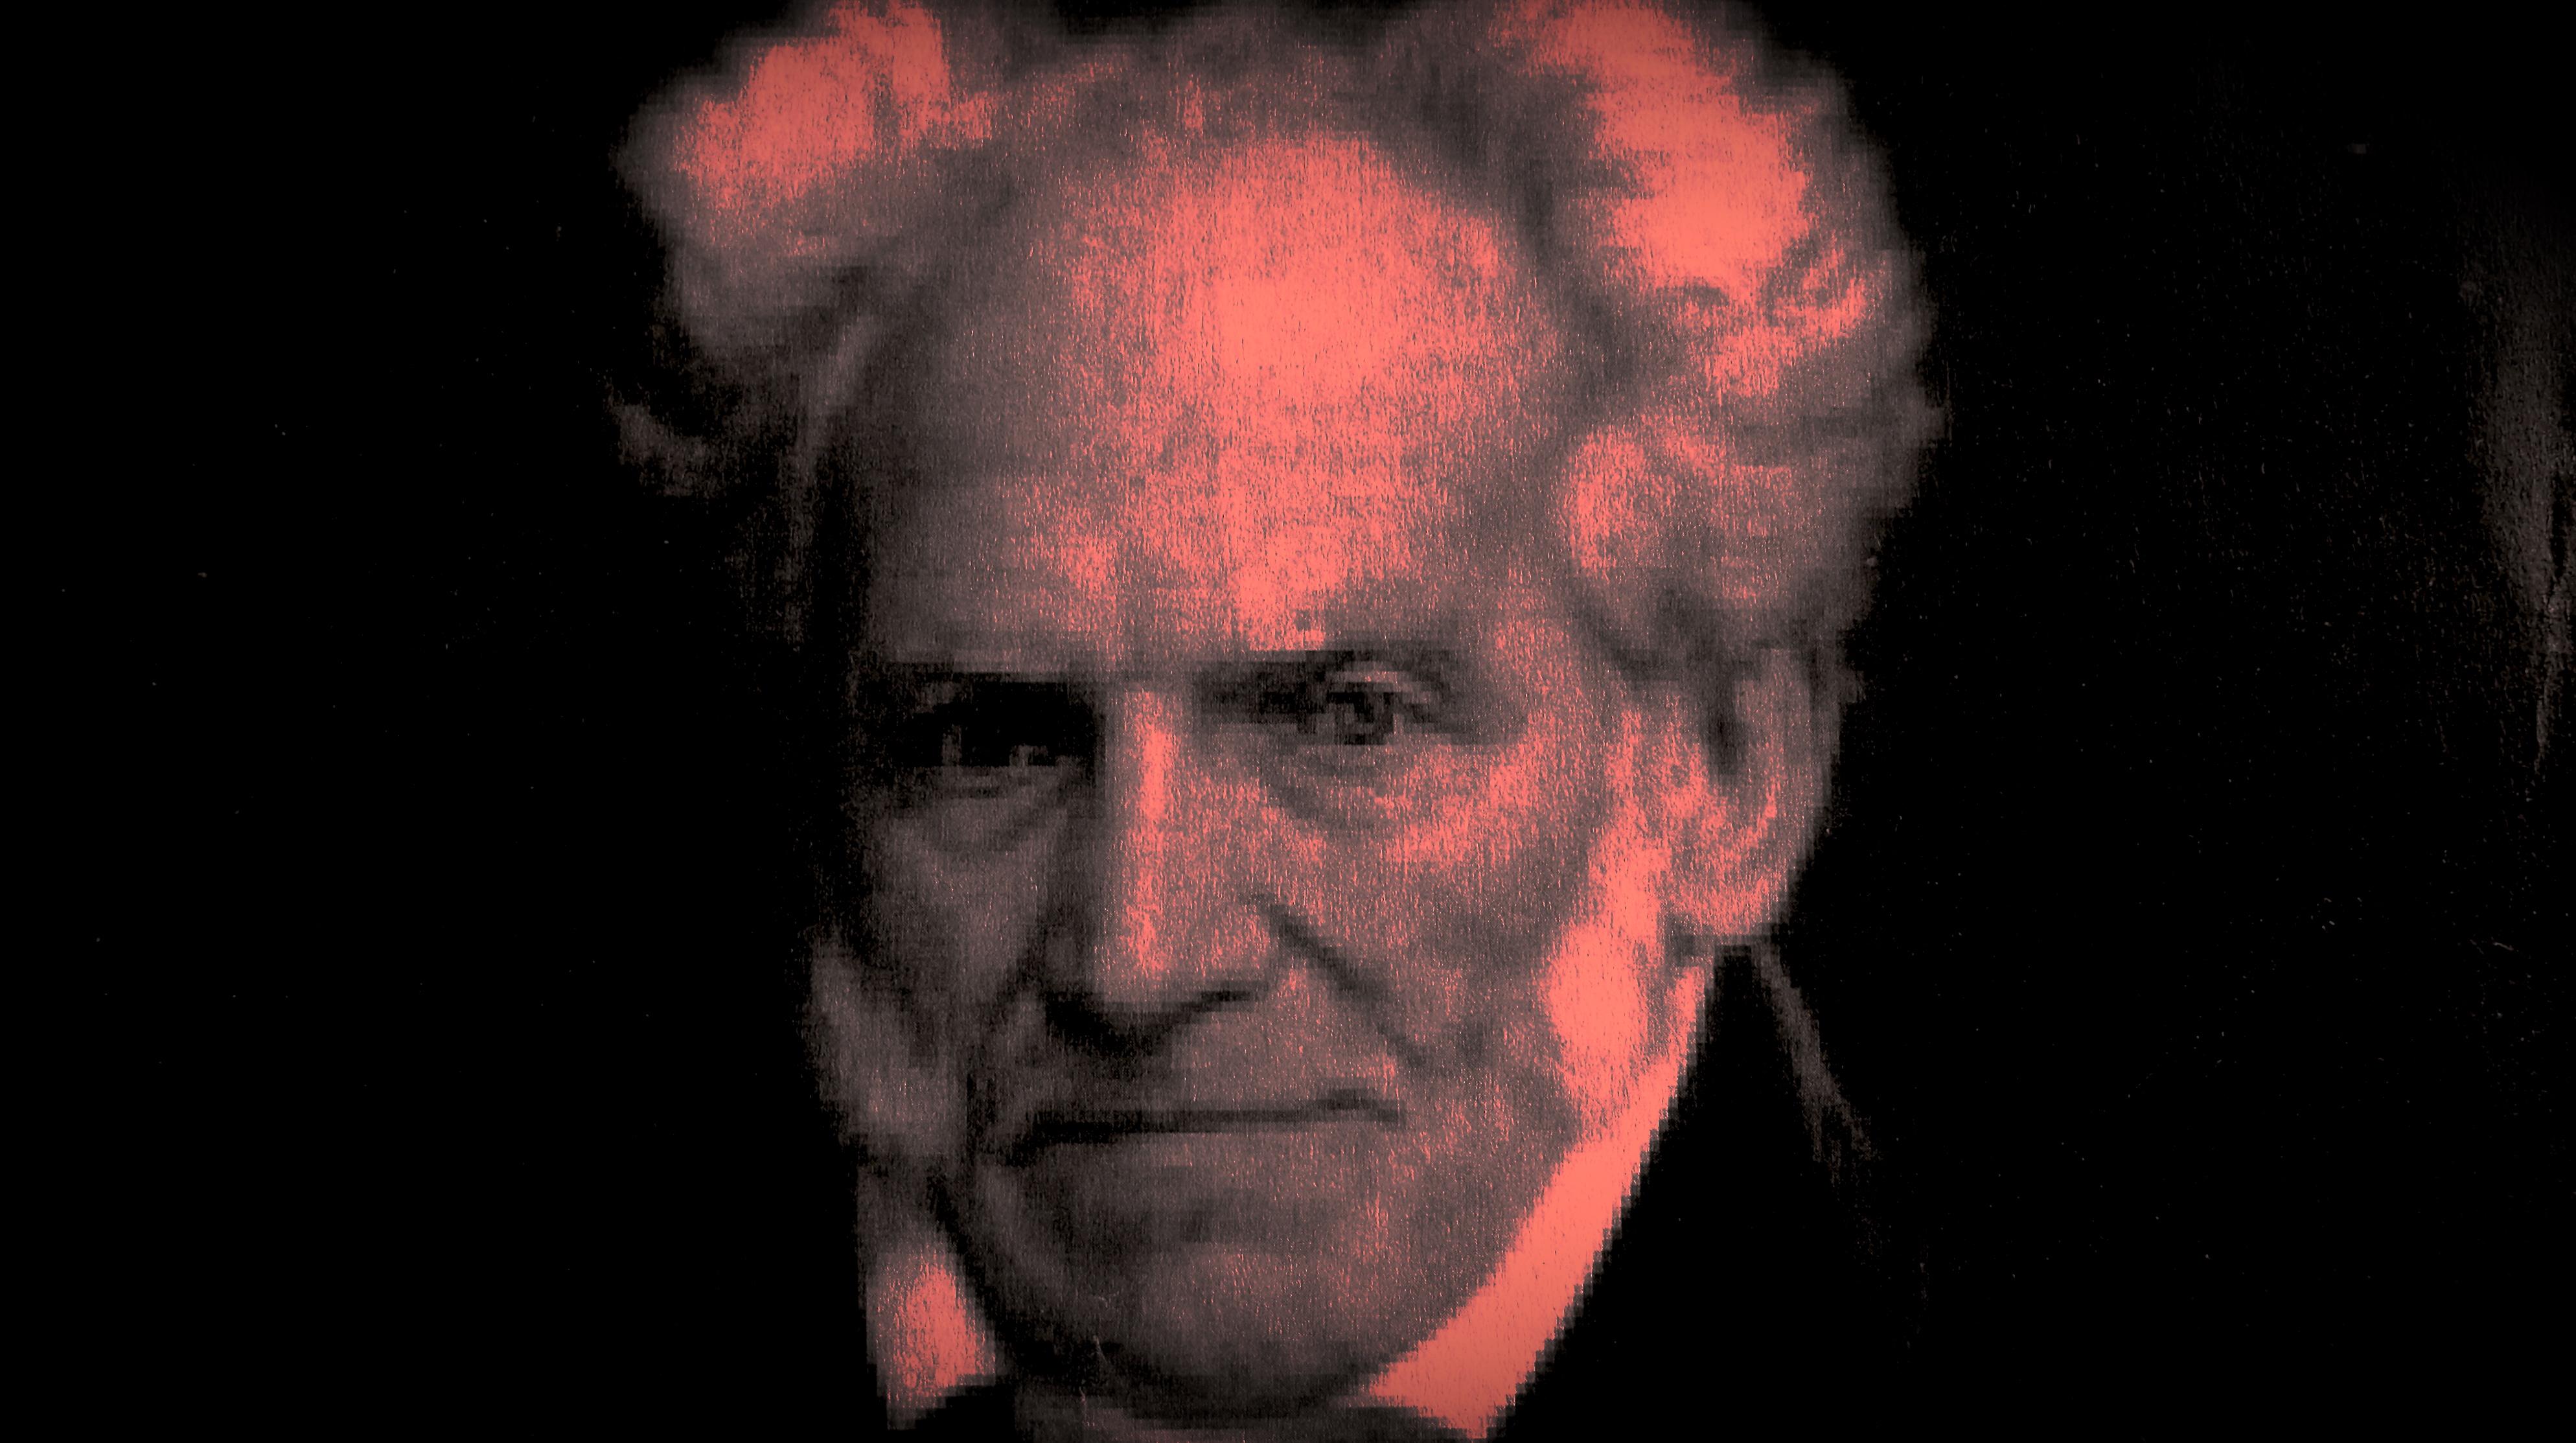 Hazlo por Schopenhauer (V): la autocensura, esa apestosa